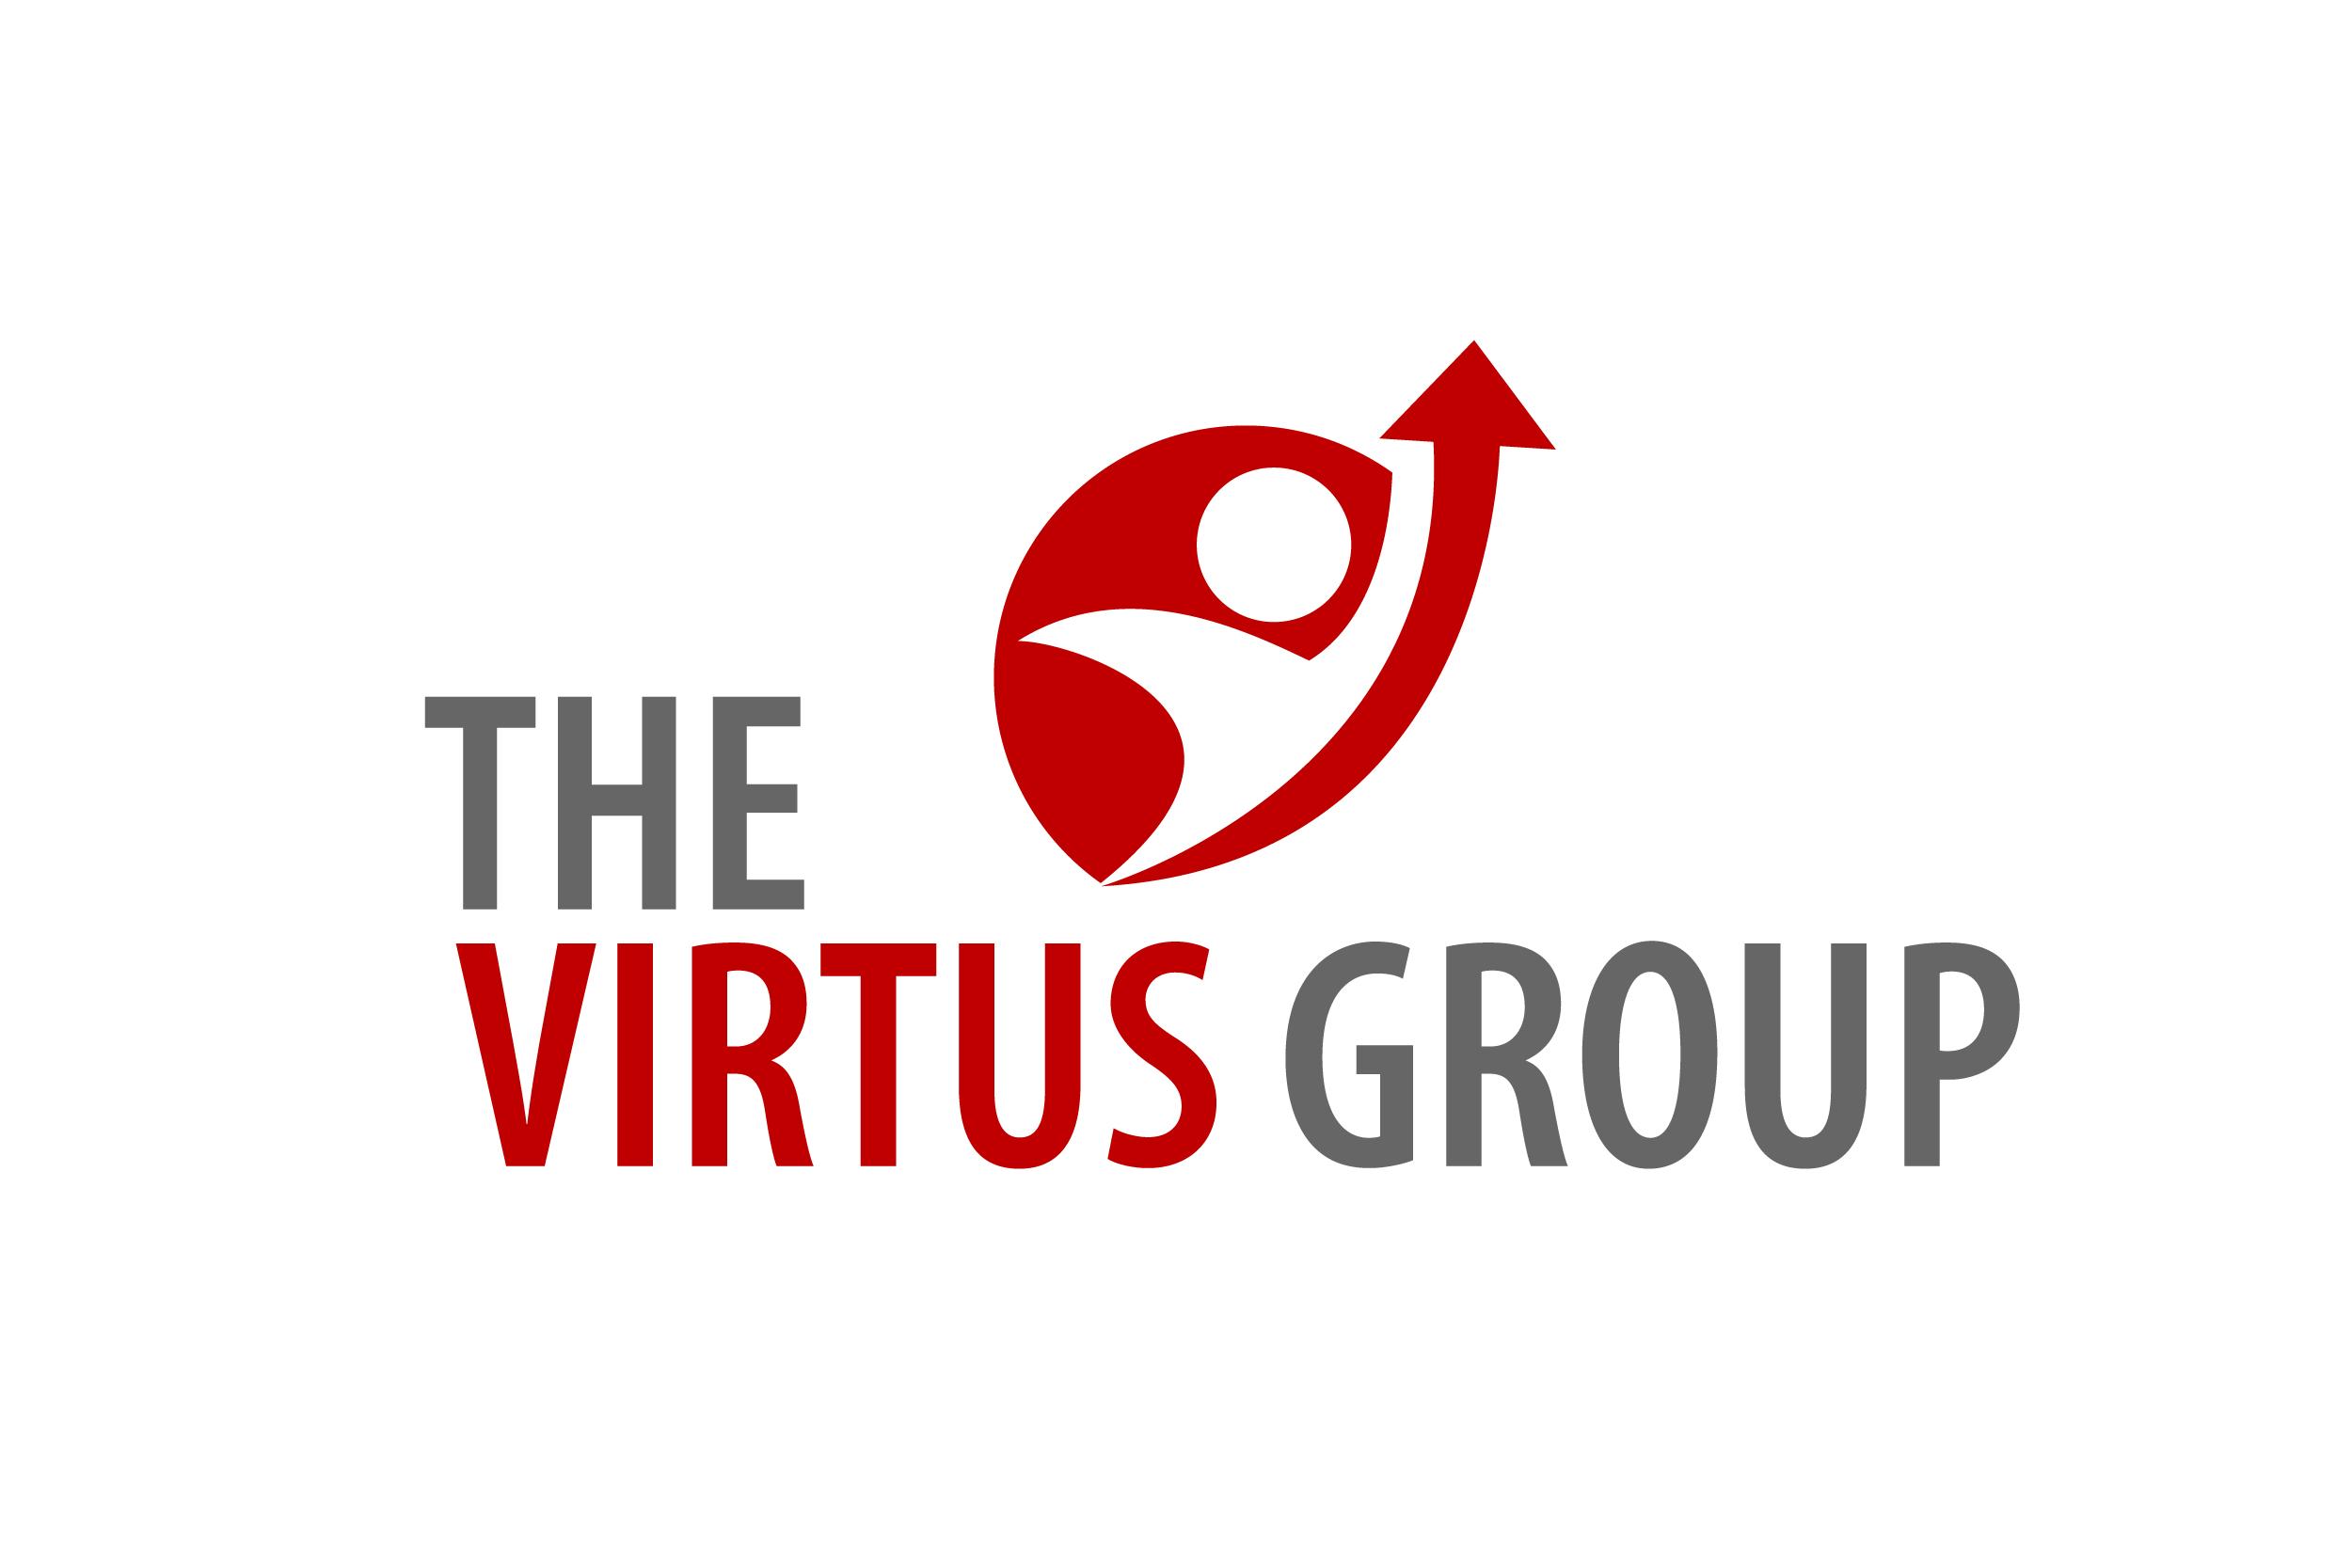 Virtus Group